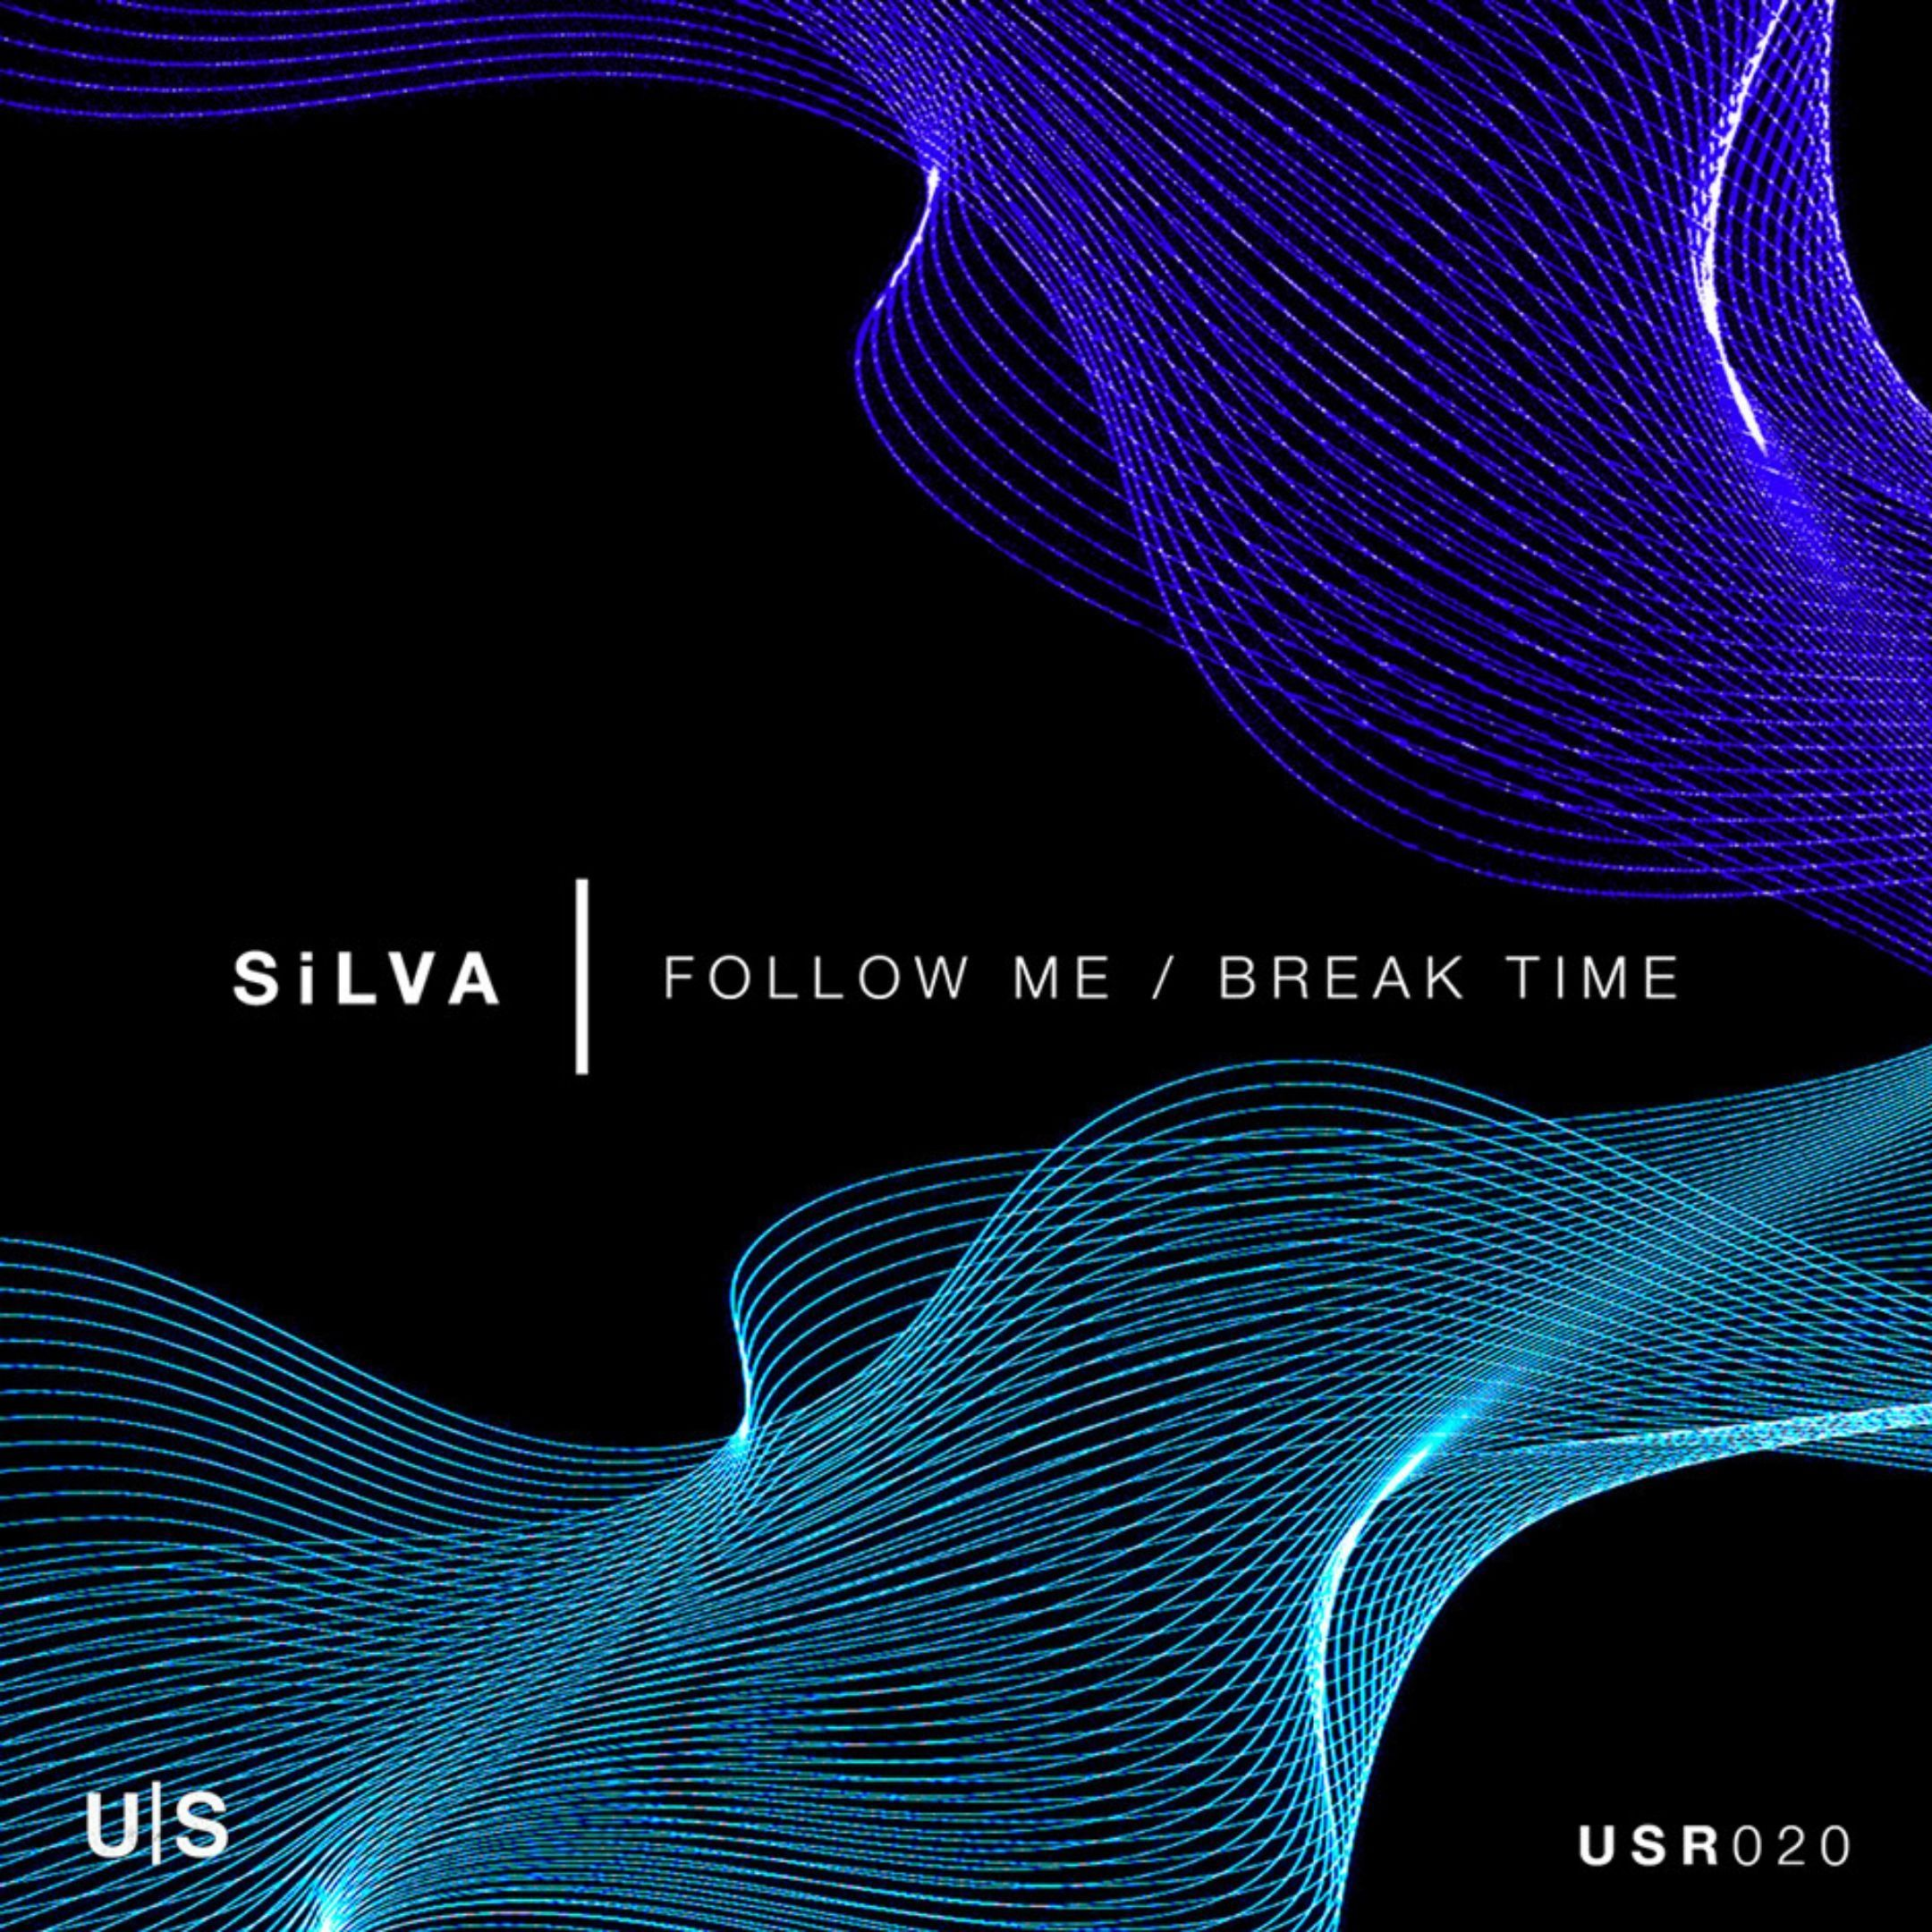 SiLVA-Follow-Me-Understated-Recordings